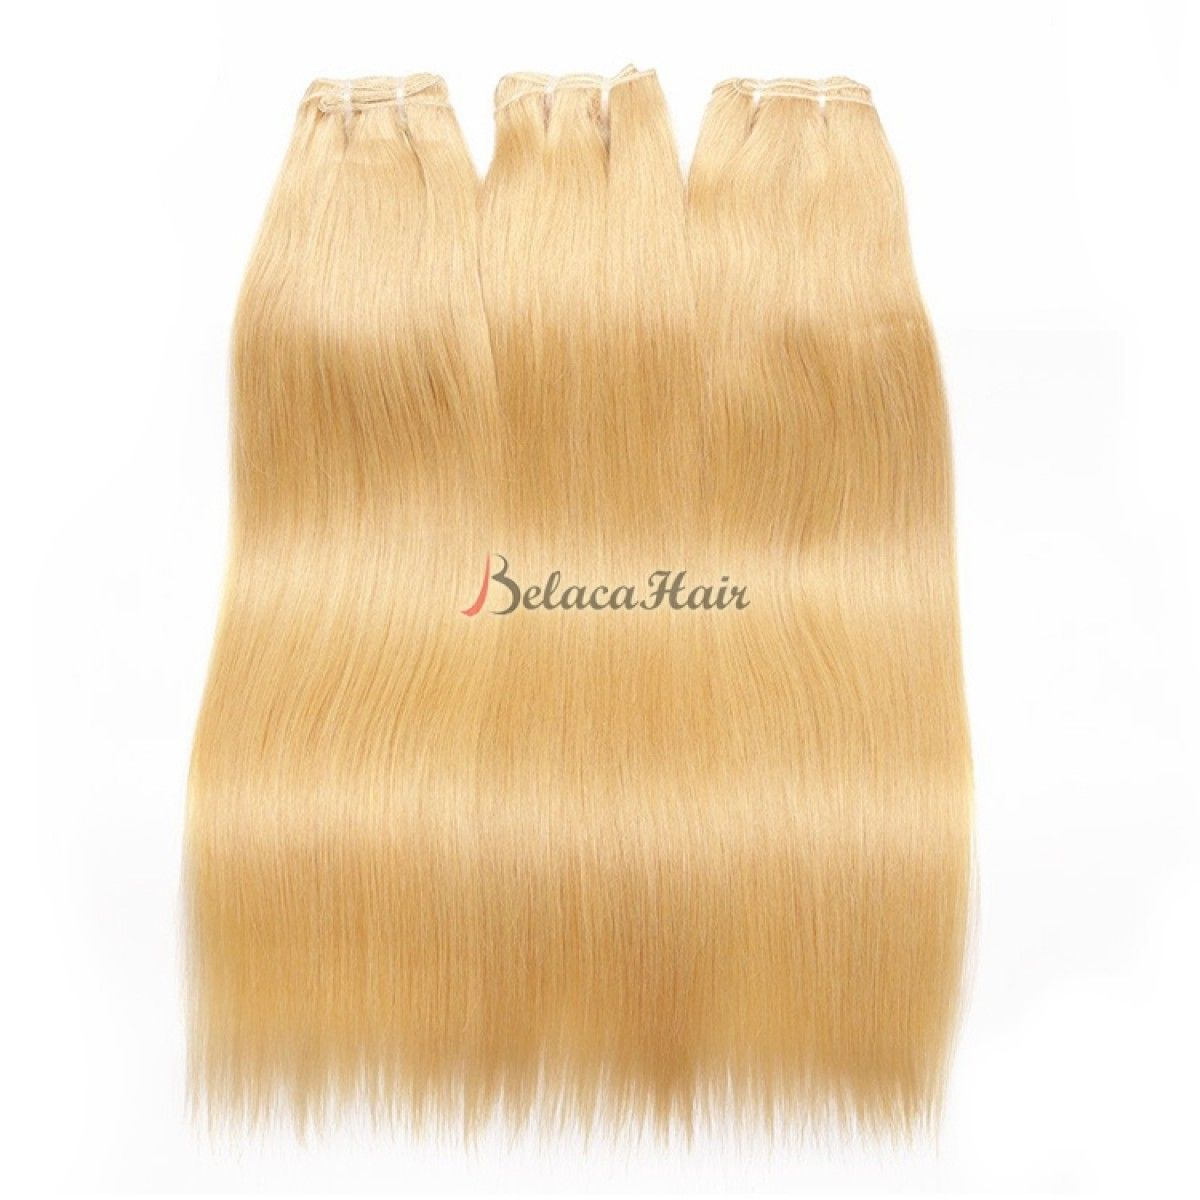 3 Bundles Blonde Human Hair Straight Color 613 Virgin Hair 4